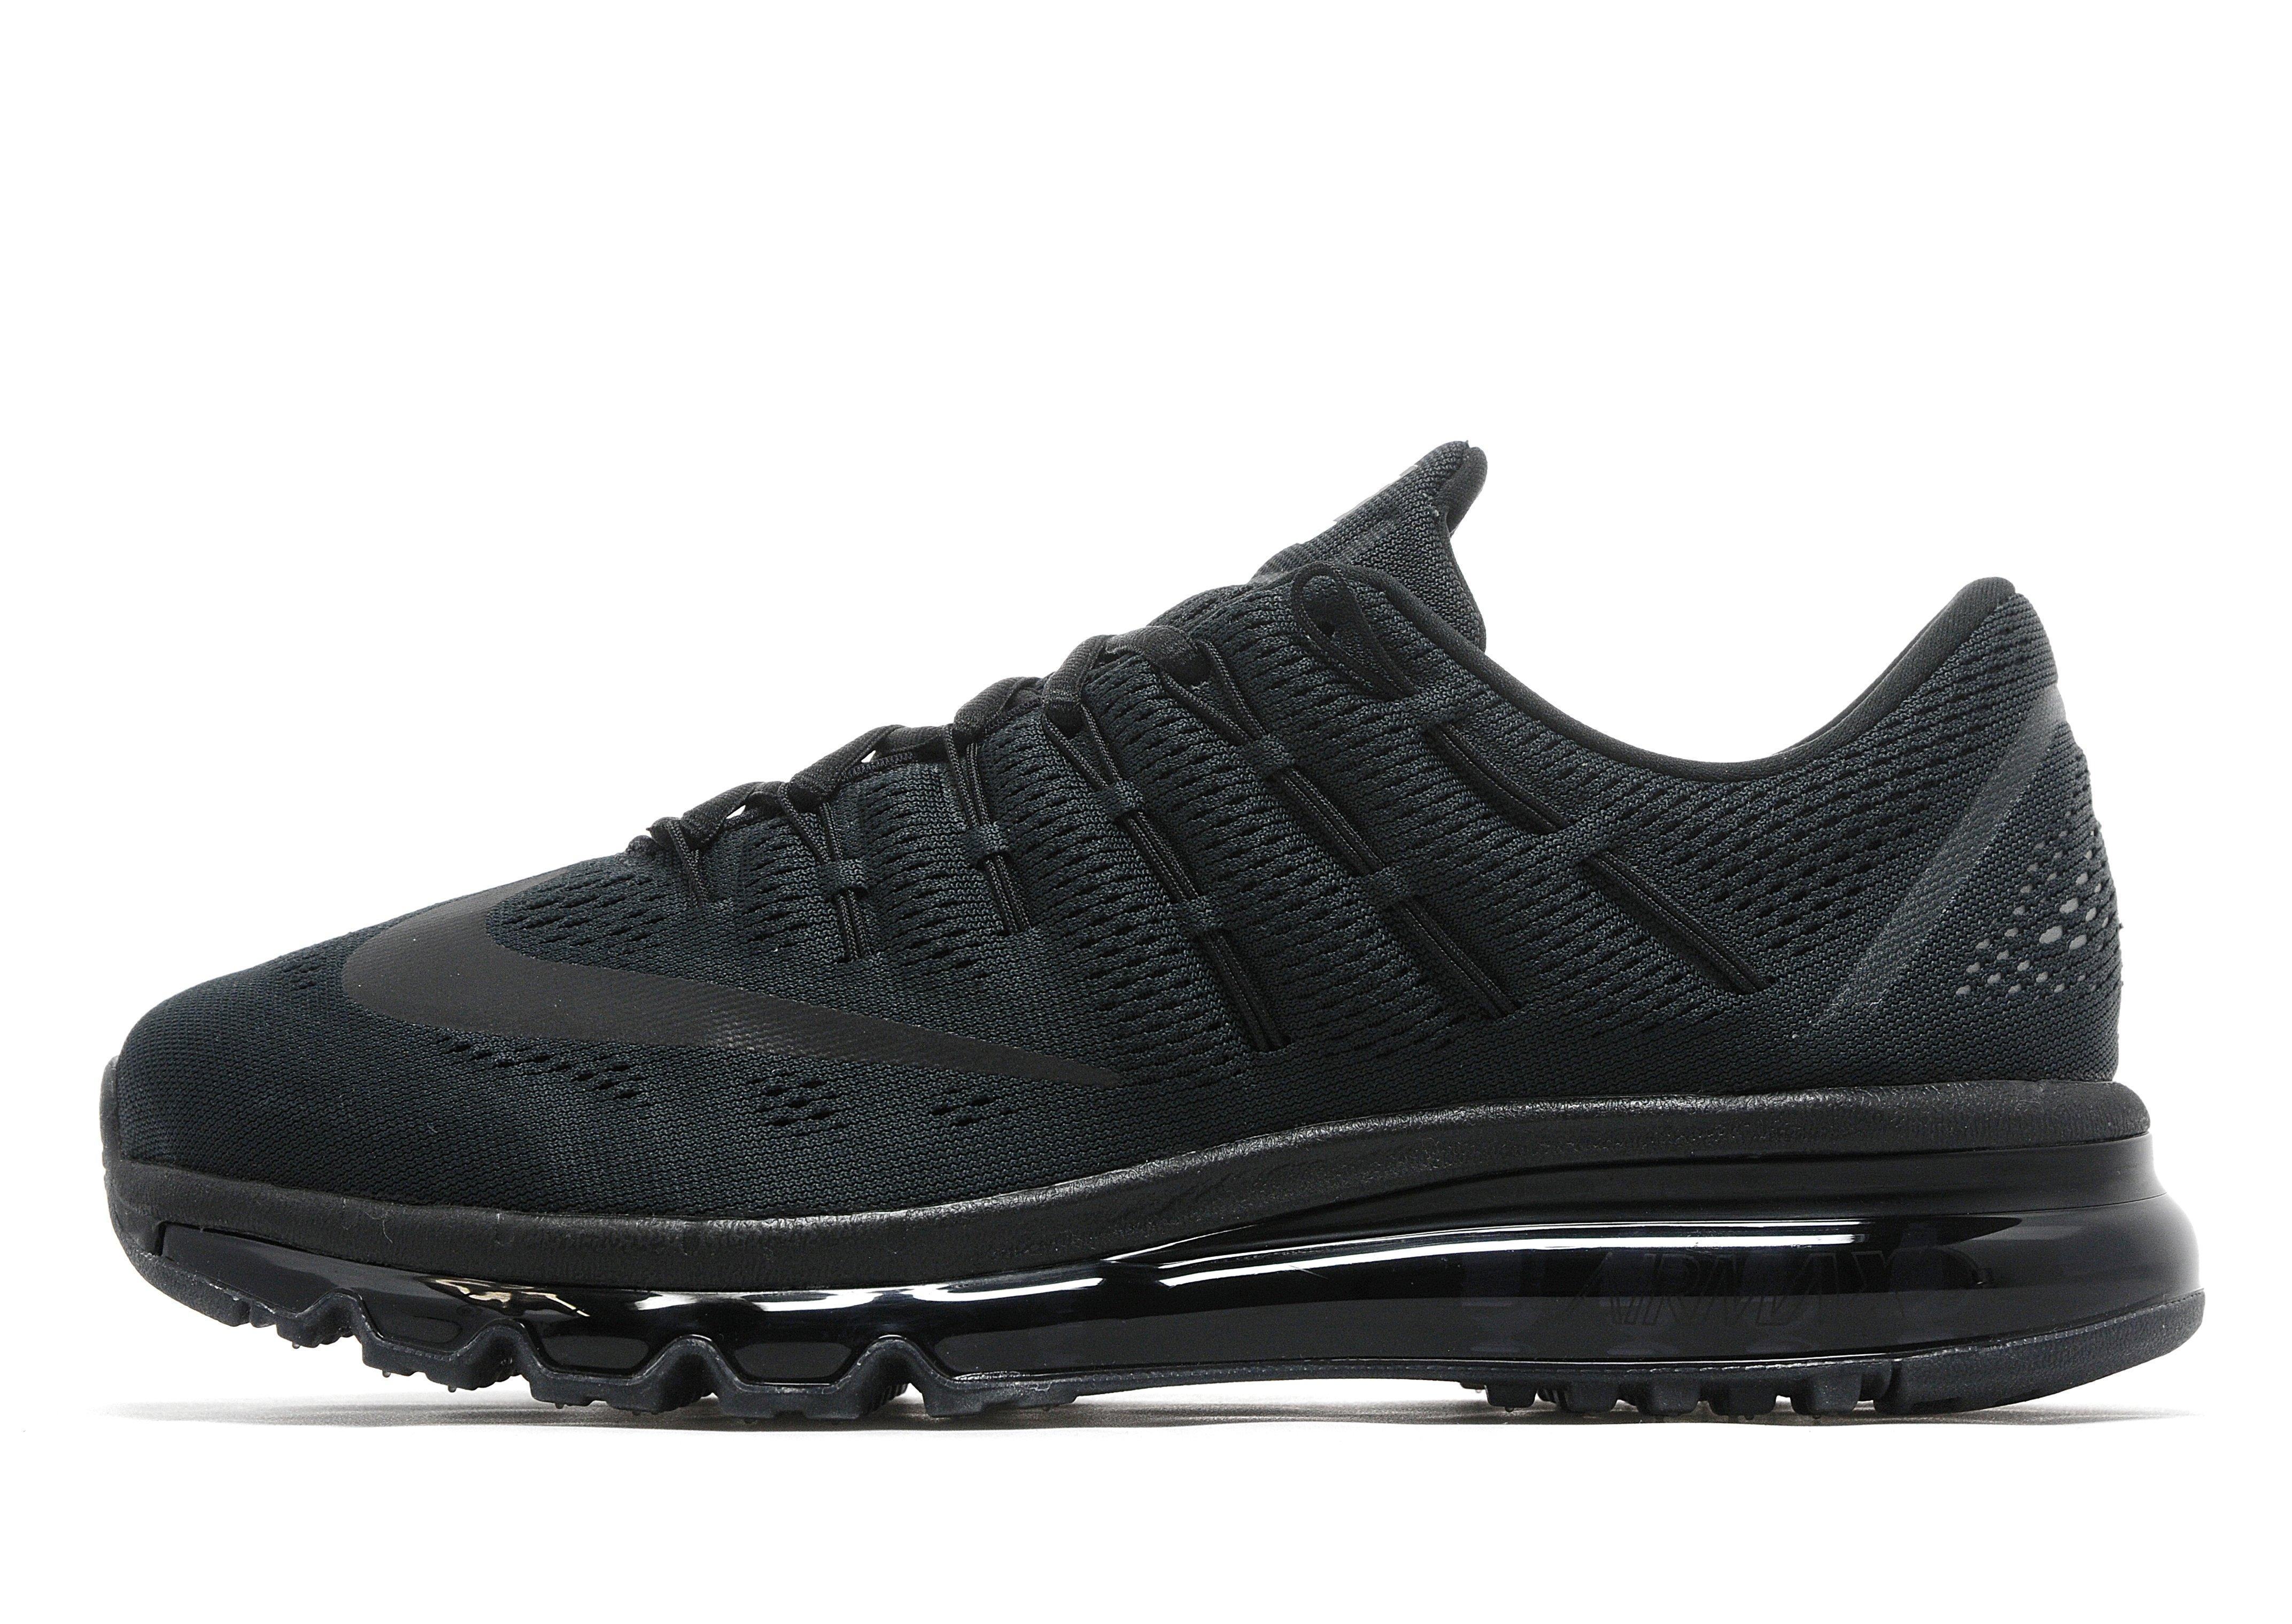 nike air max 2016 zwart